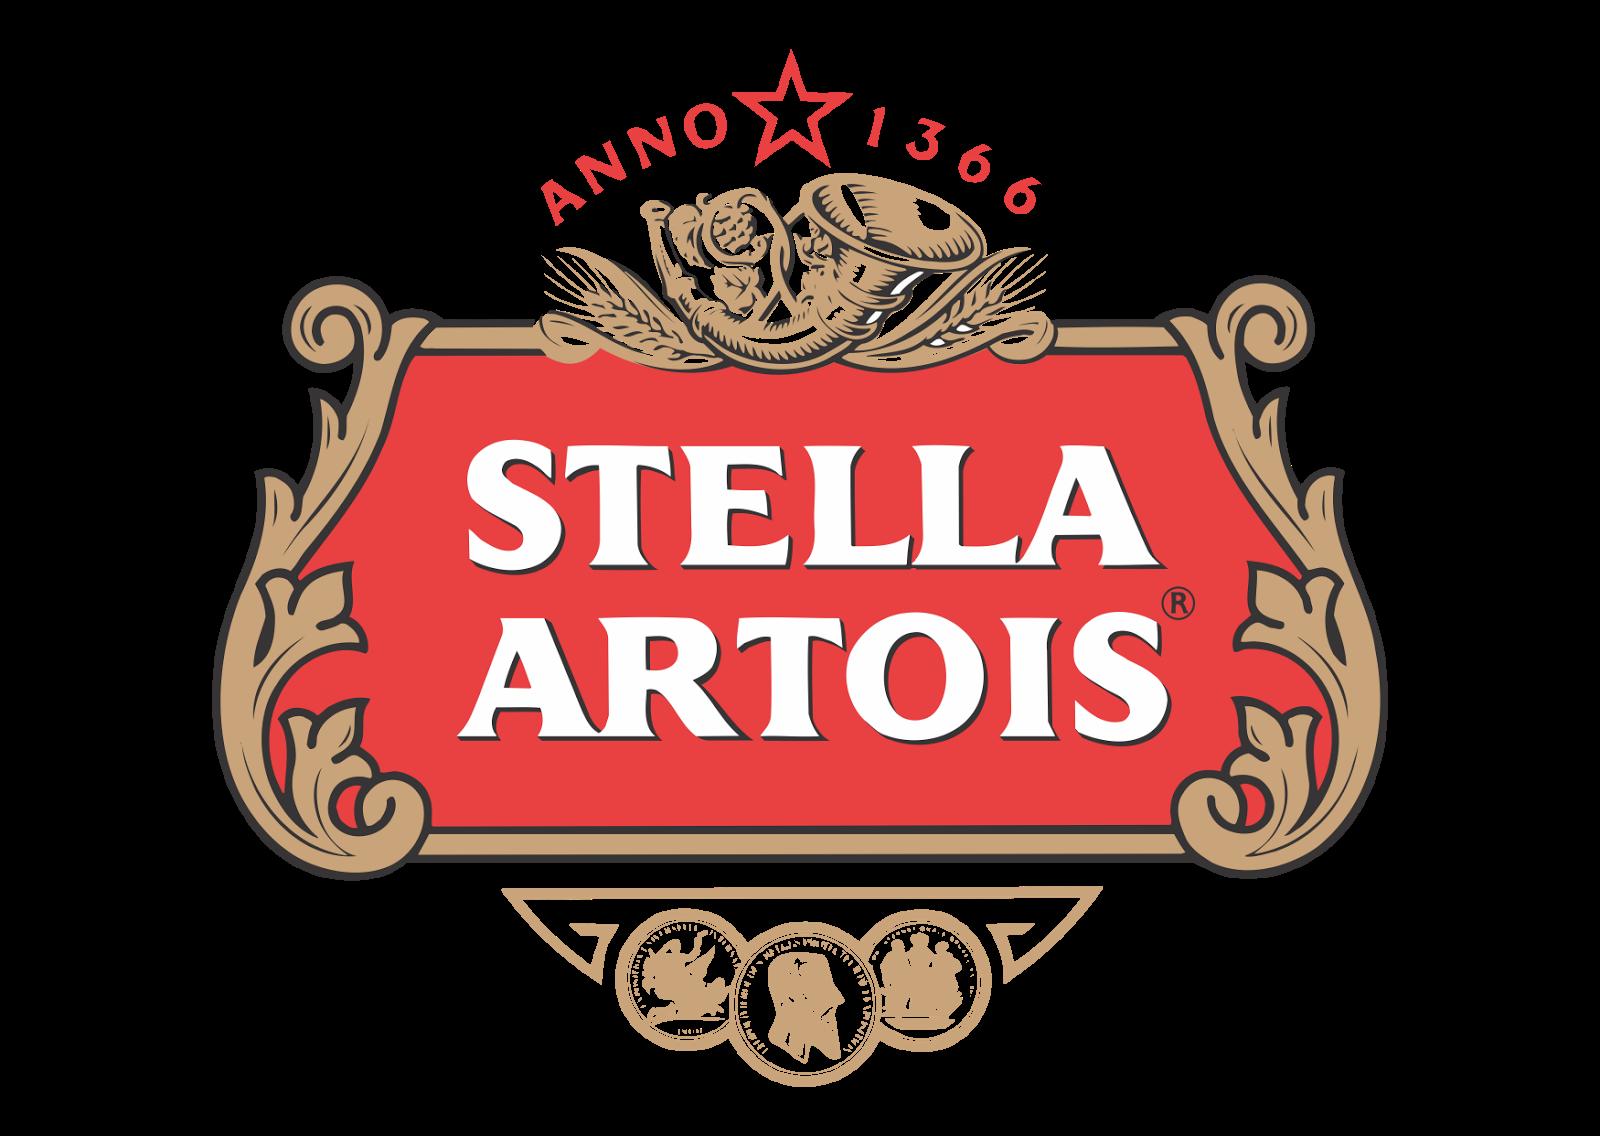 Stella artois logo vector format cdr ai eps svg pdf png